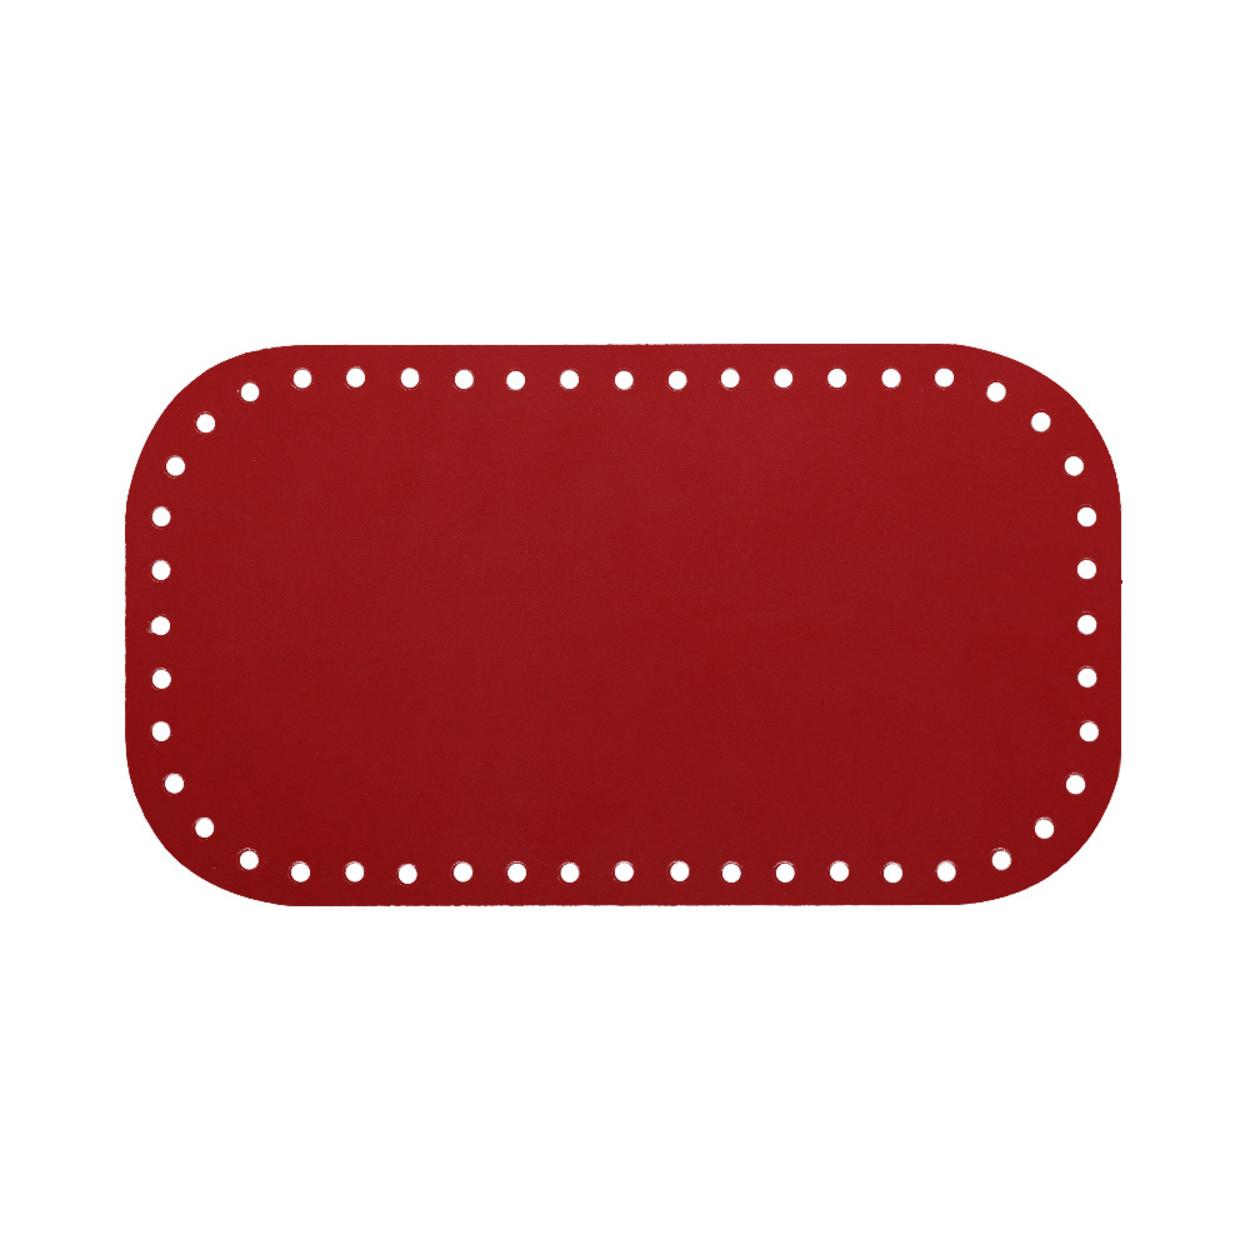 Кожа - Дно для сумки 12 х 21 см. Red hot